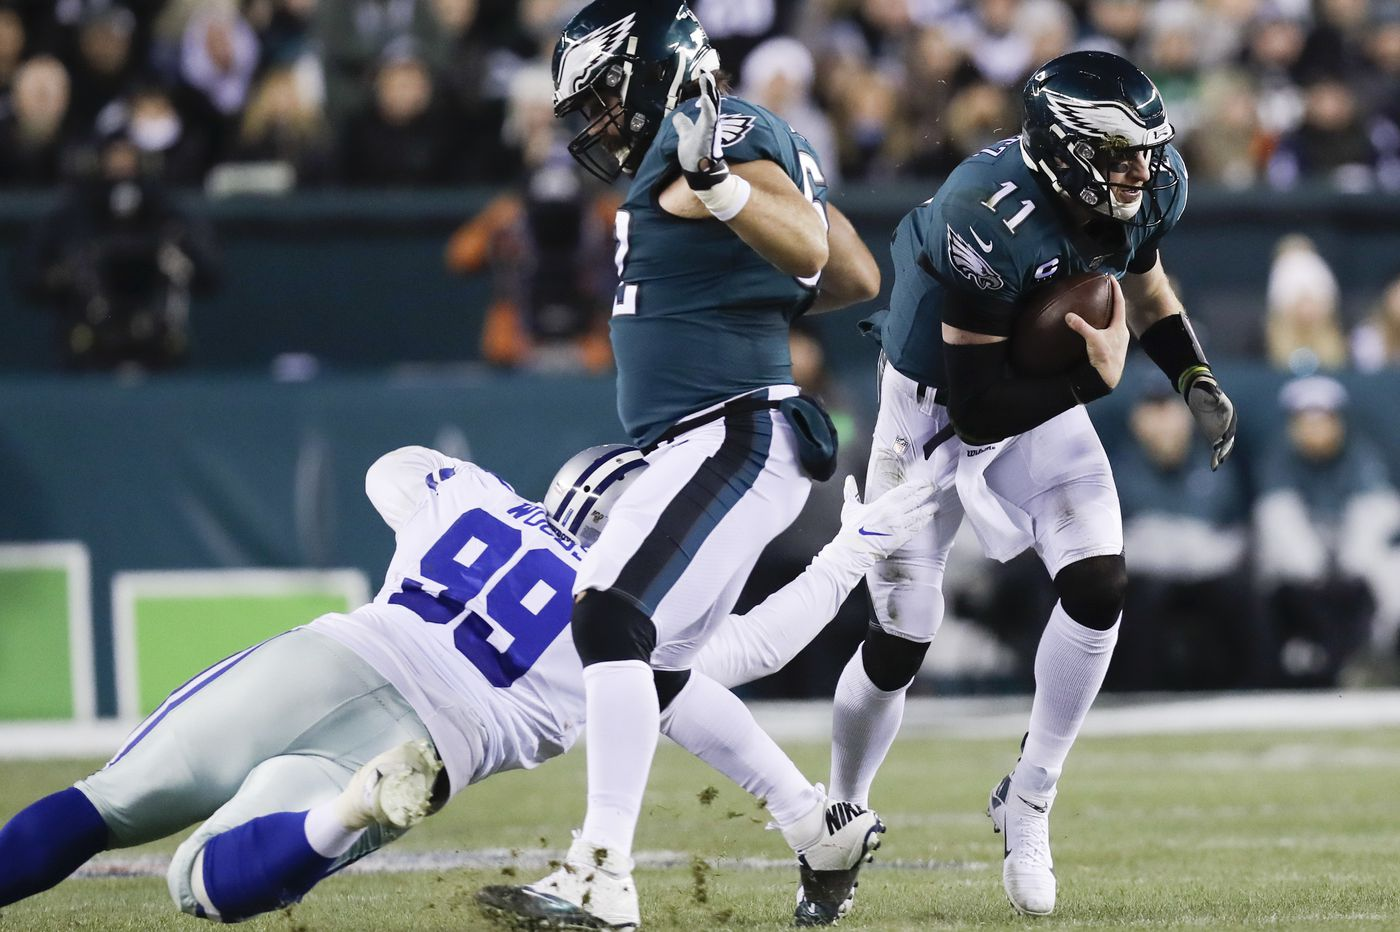 Carson Wentz and Lamar Jackson embody the benefits and risks of modern quarterbacks | Mike Sielski